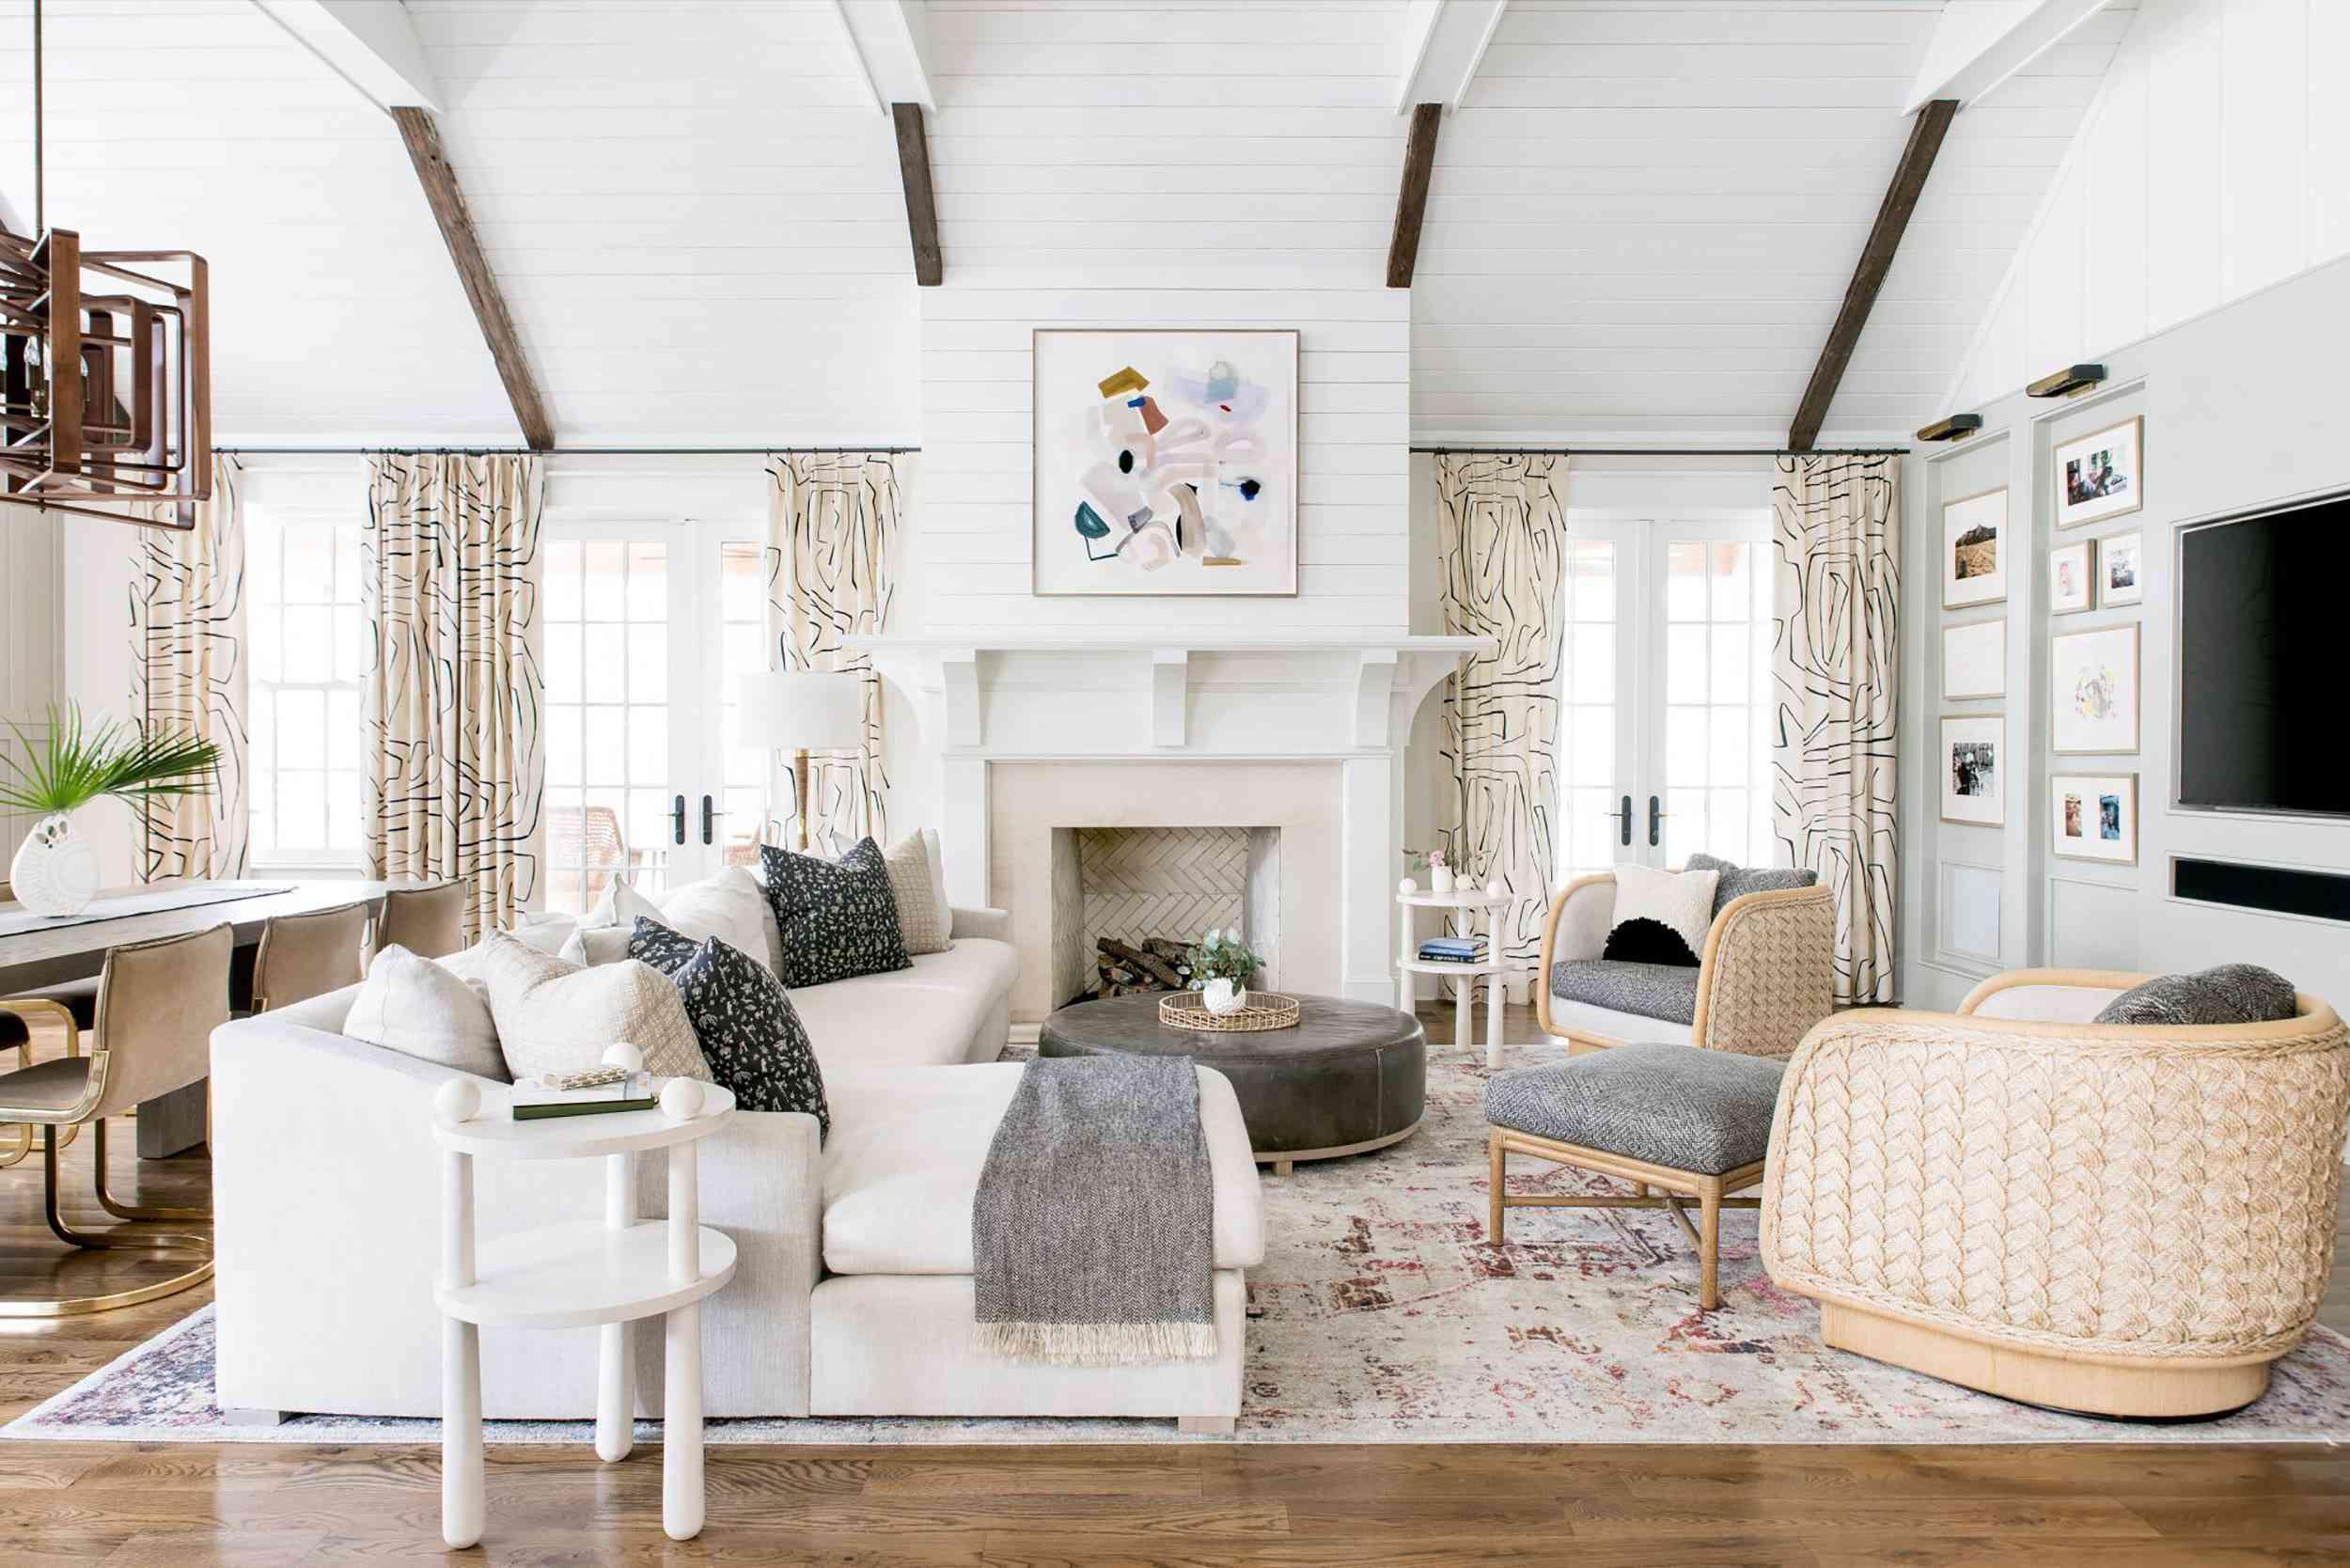 6 Southern Decor Ideas From A Charleston Interior Designer